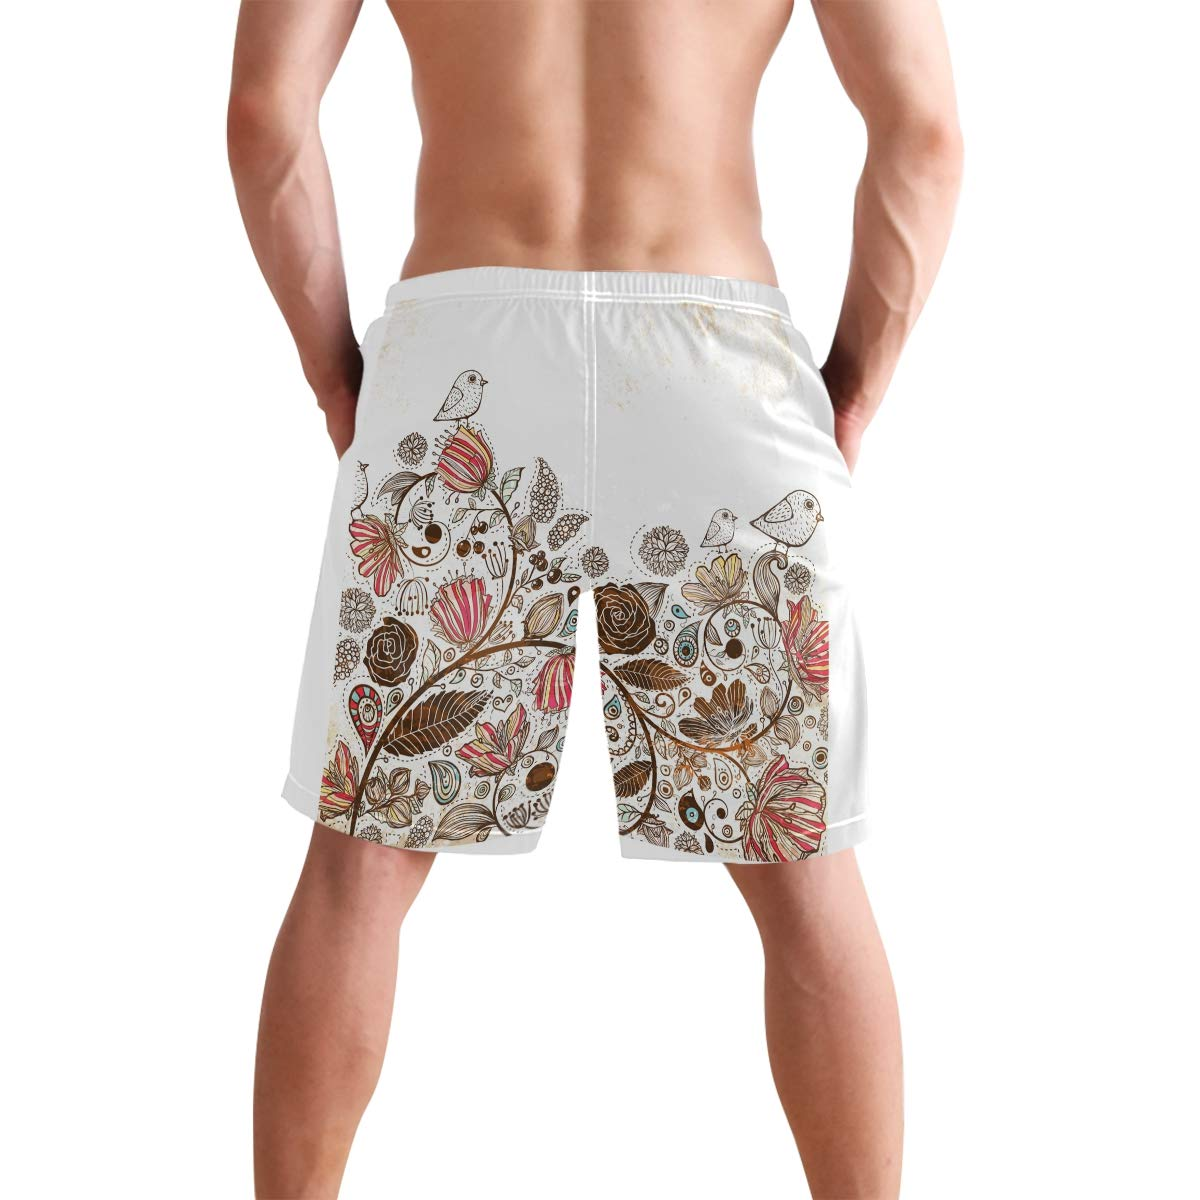 DEYYA Magpie Summer Beach Shorts Pants Mens Swim Trunks Board Short for Men